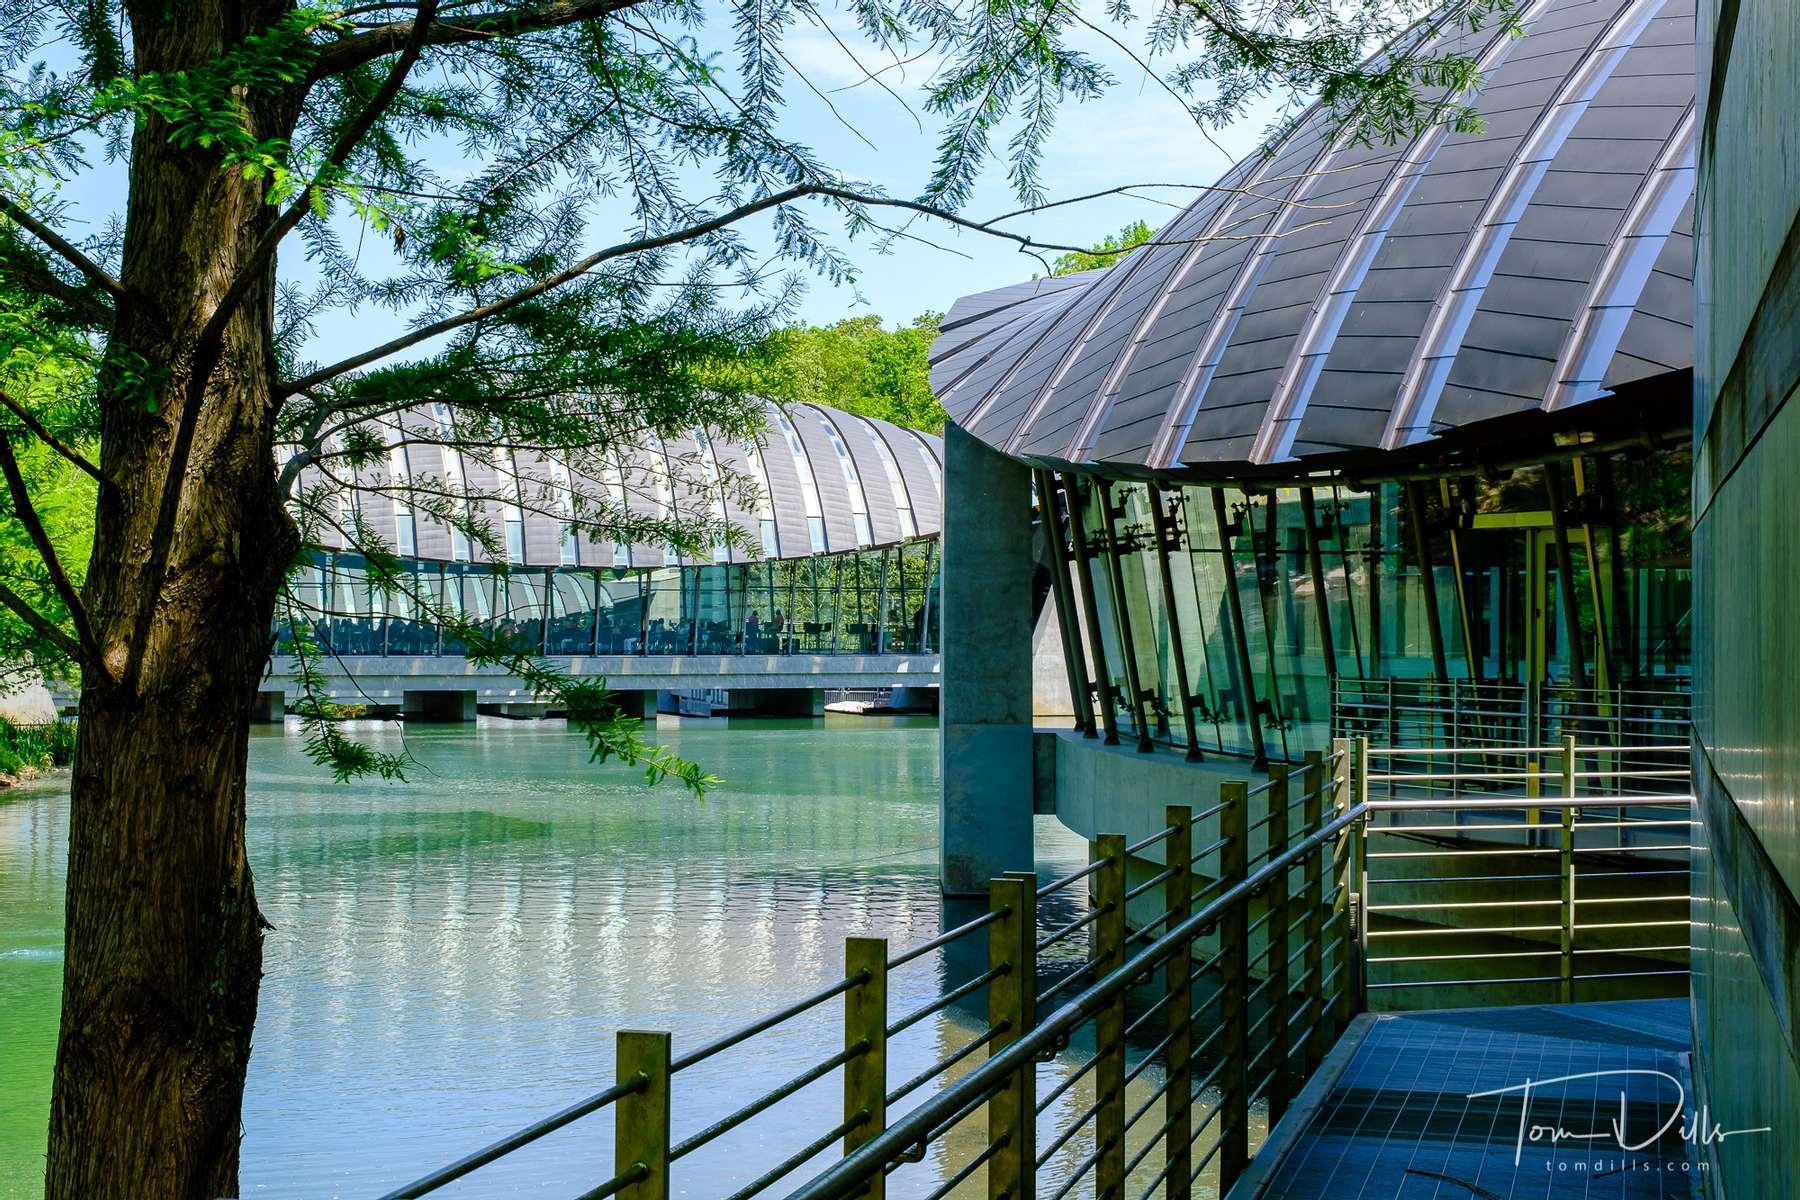 The Crystal Bridges Museum of American Art in Bentonville, Arkansas